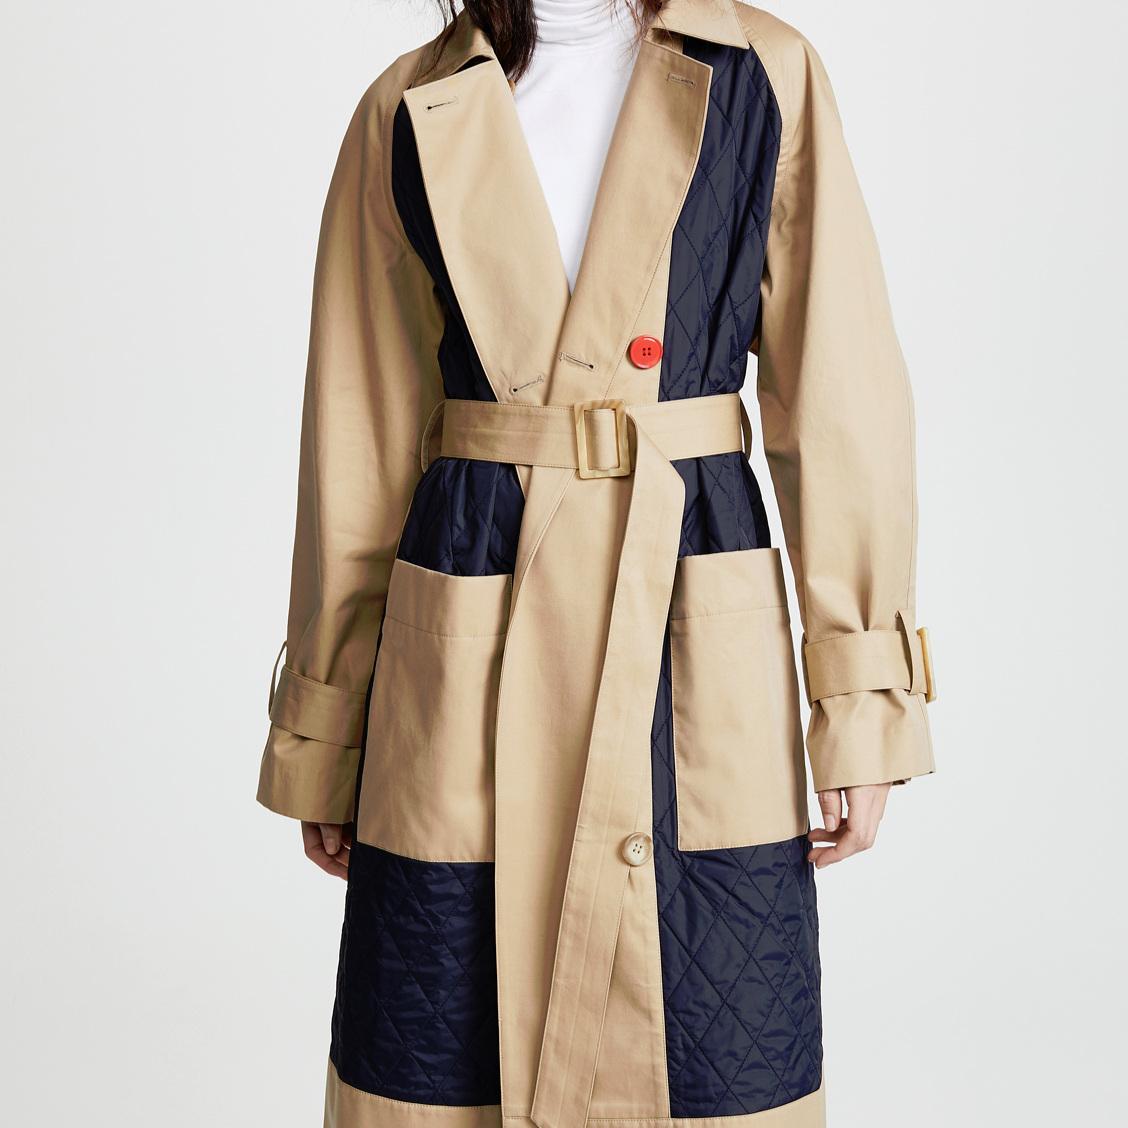 trench-coat-tibi-christie-ferrari-nyfw